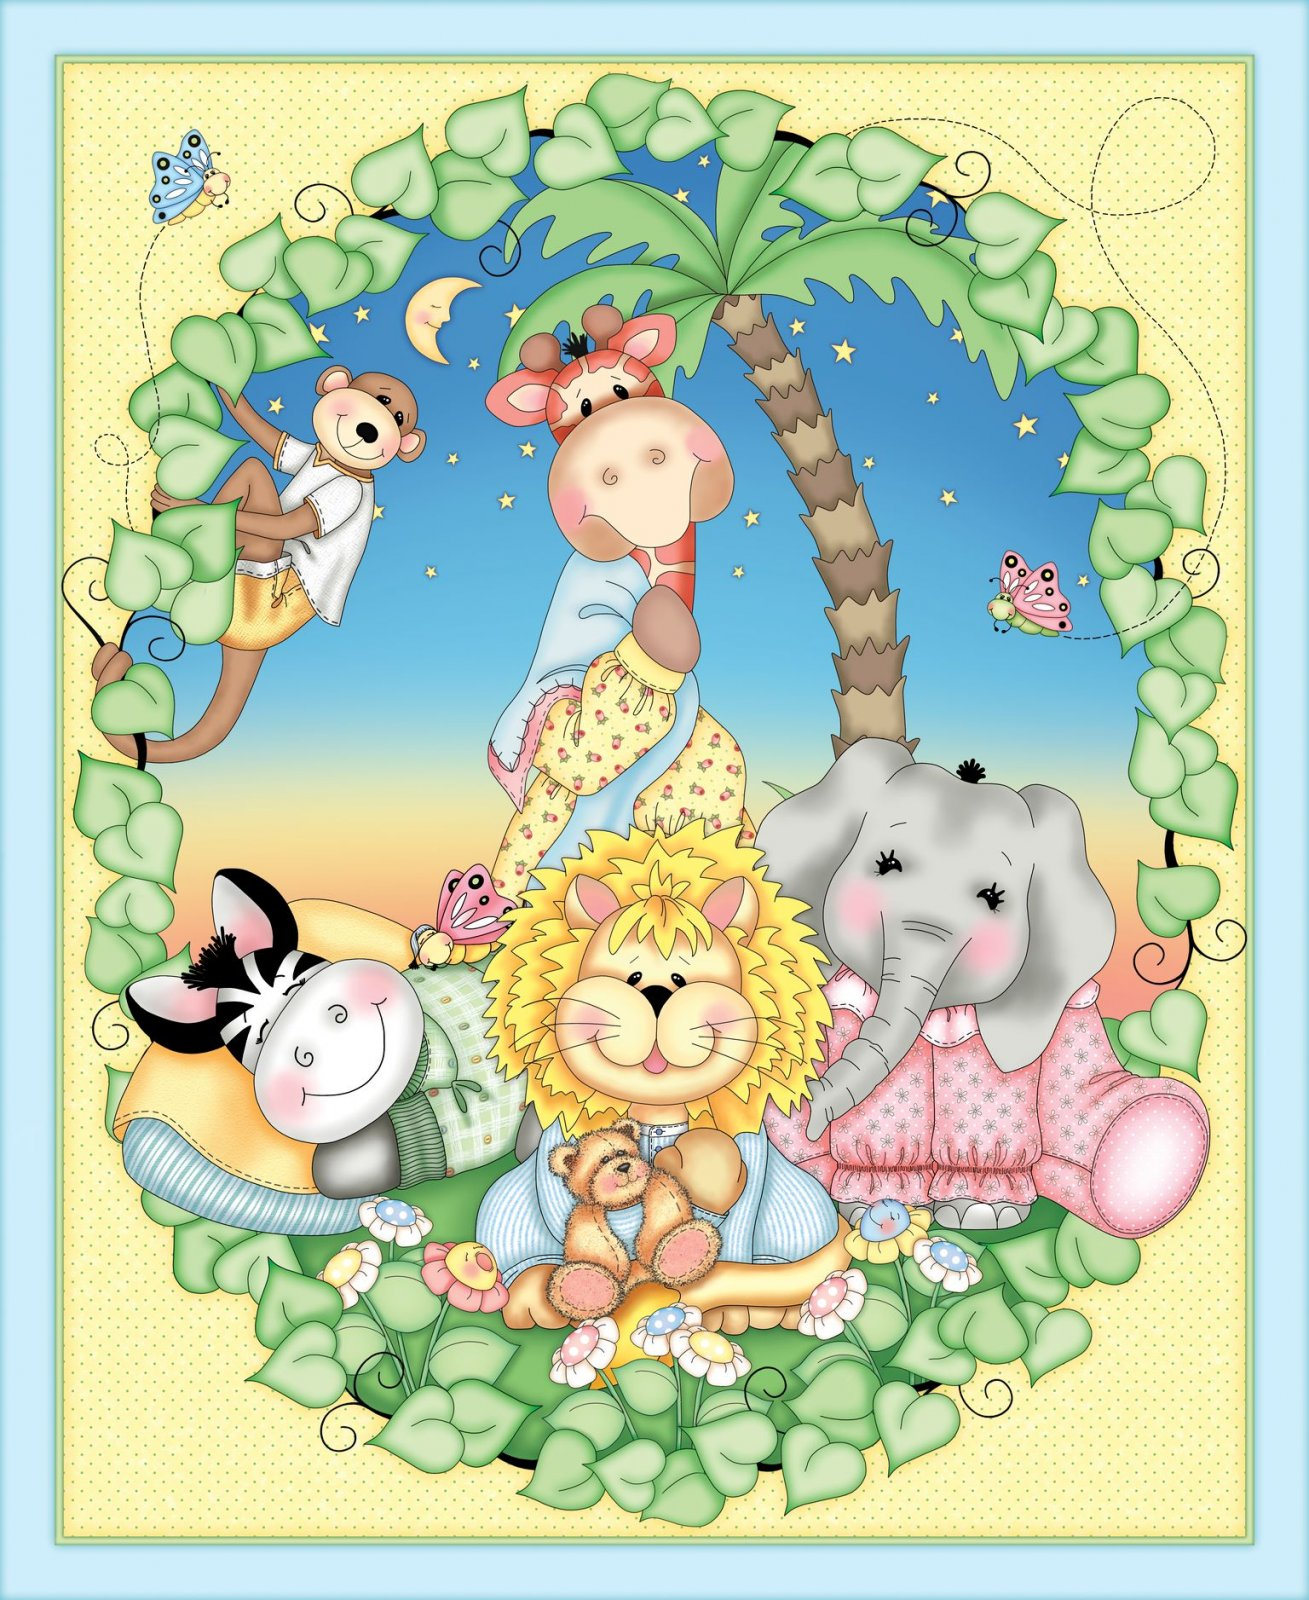 SC-Bazooples 52214-A620715P Sweet Dreams Quilt Panel